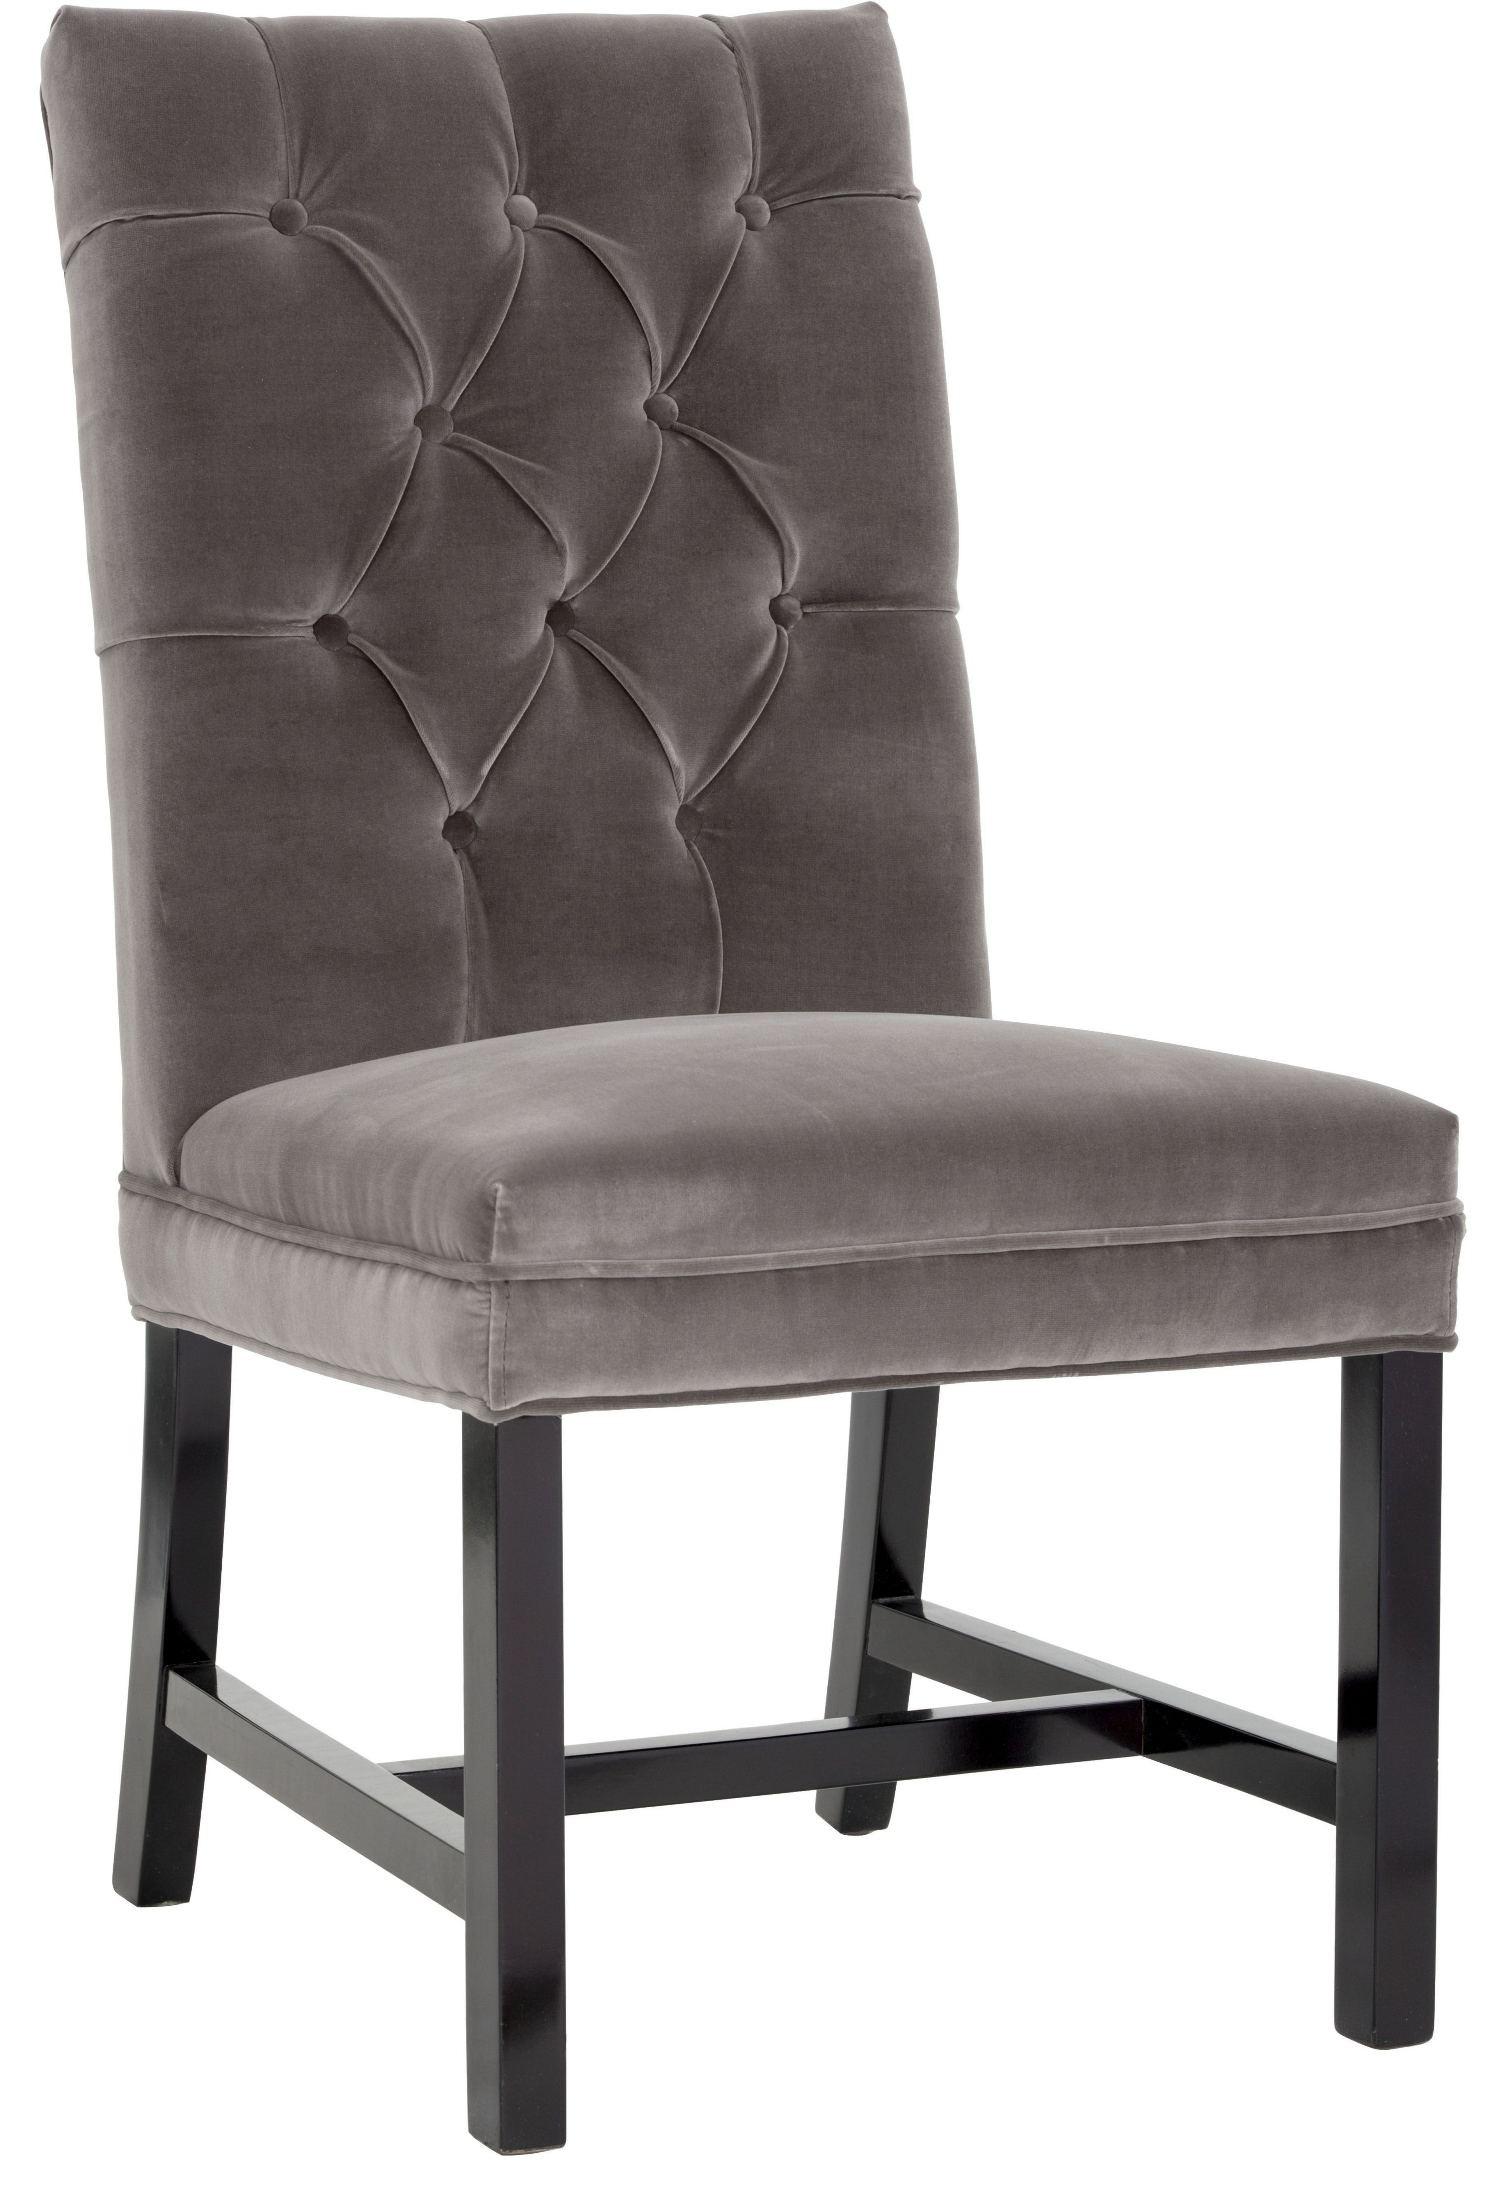 Orwalk Giotto Grey Fabric Dining Chair Sunpan